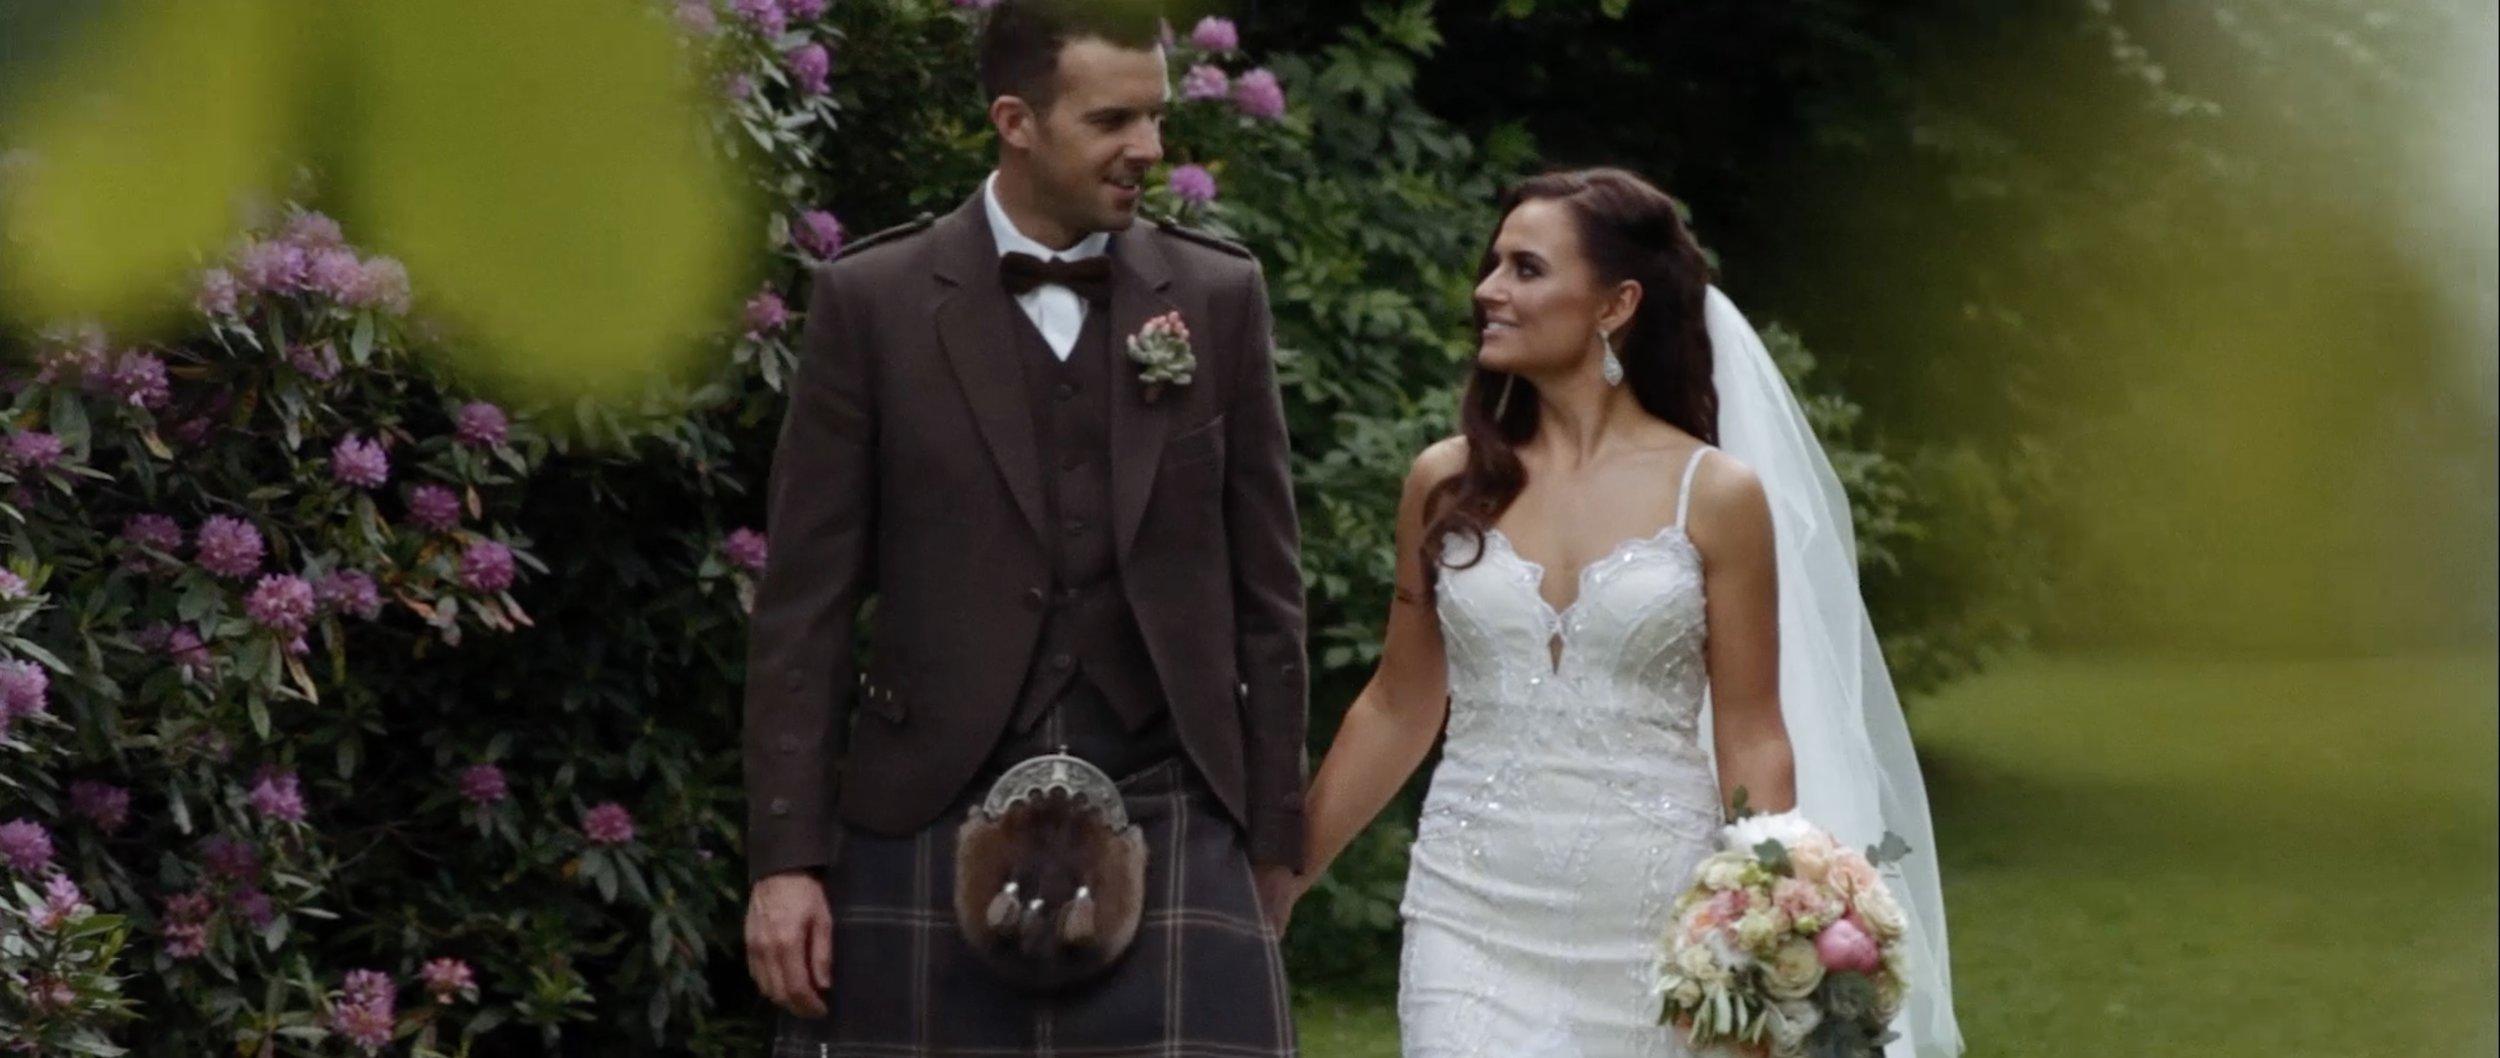 pollokshields-burgh-hall-wedding-videographer_LL_06.jpg